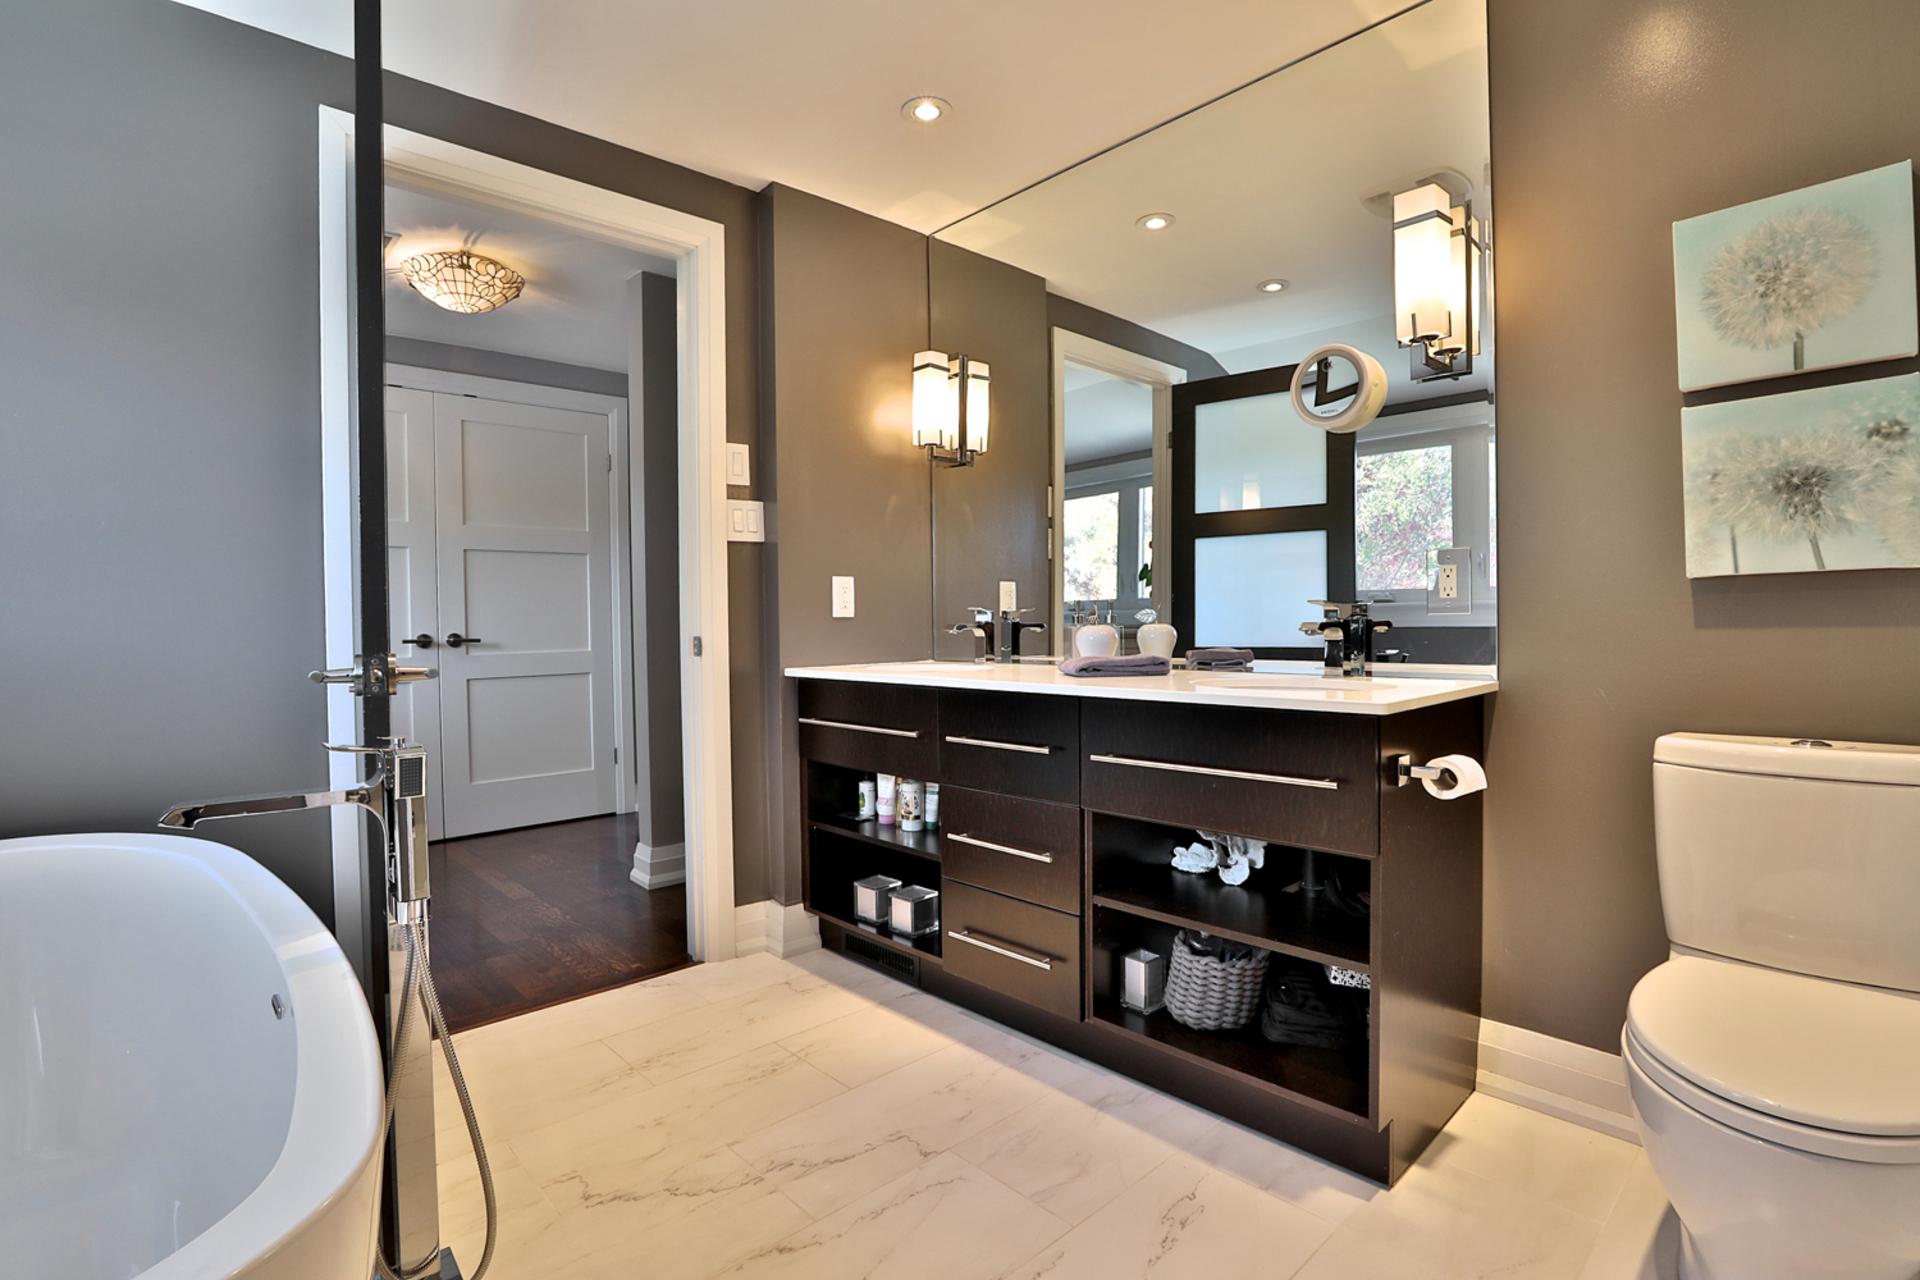 5 Piece Ensuite Bathroom at 2 Barnwood Court, Parkwoods-Donalda, Toronto